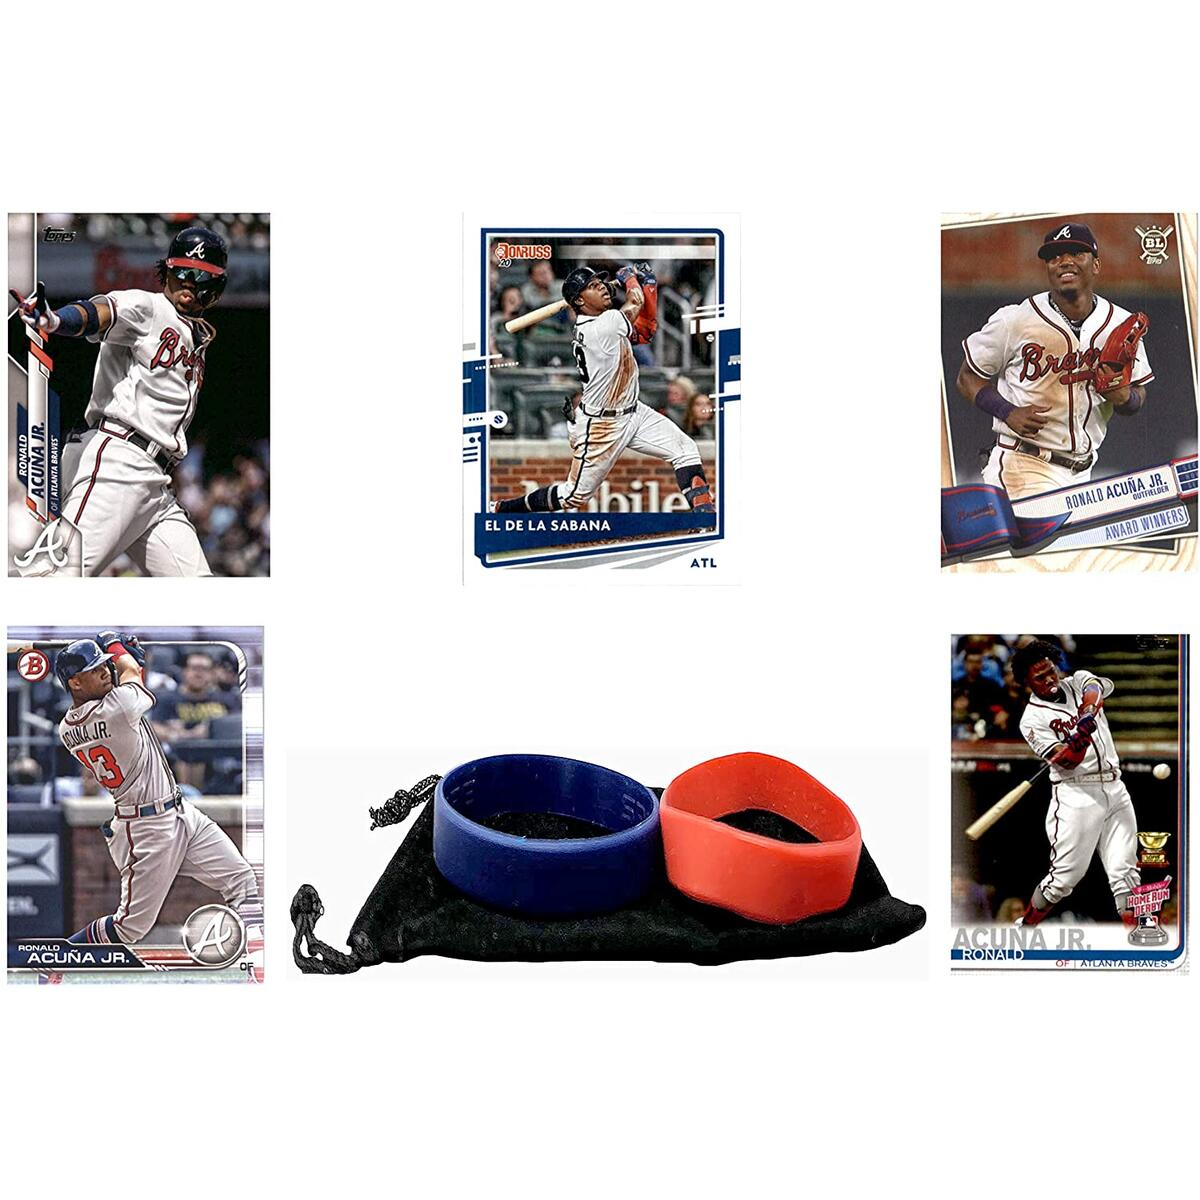 Ronald Acuna Jr. Baseball Cards (5) ASSORTED Atlanta Braves Trading Card and Wristbands Gift Bundle